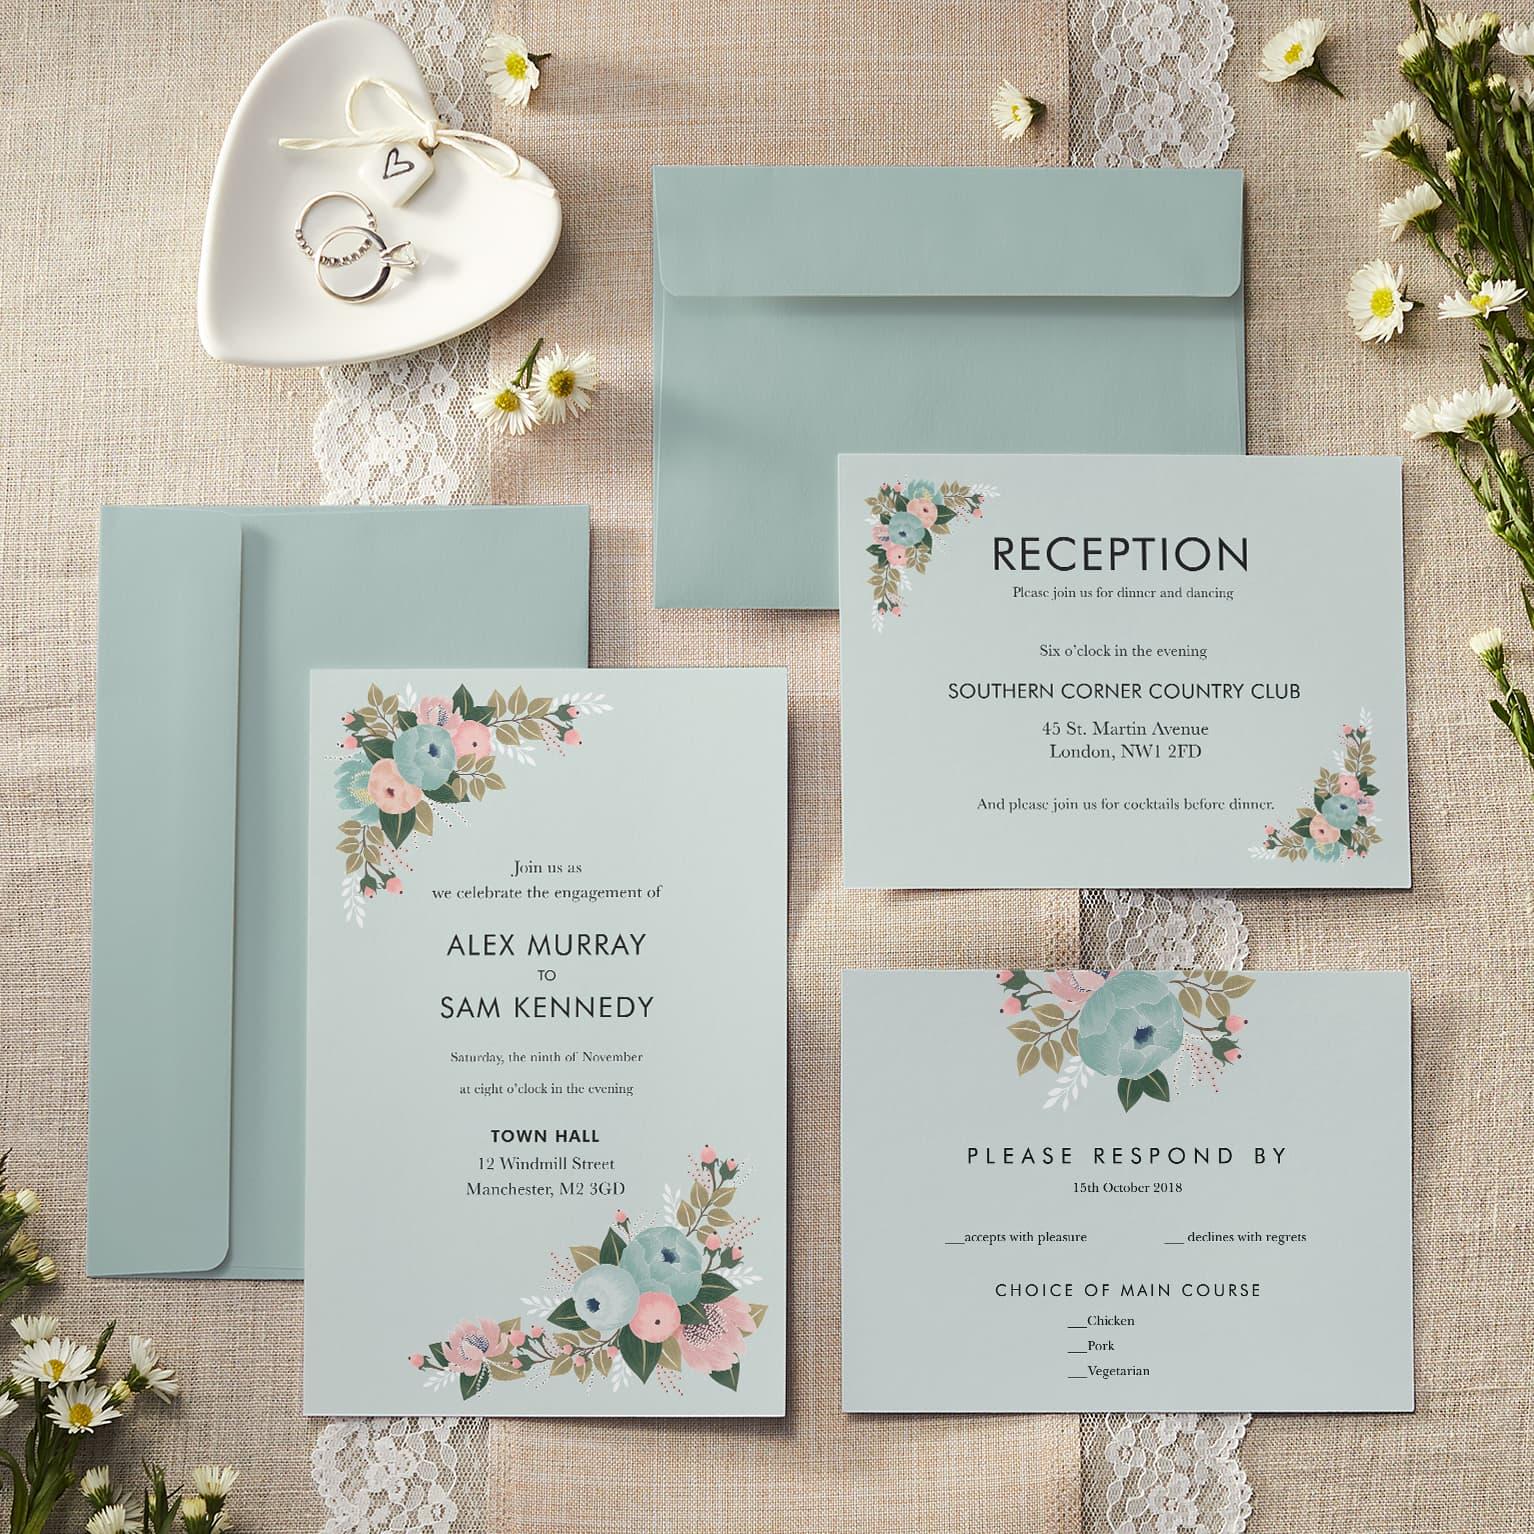 Personalised Wedding Invitations & Announcements | Vistaprint